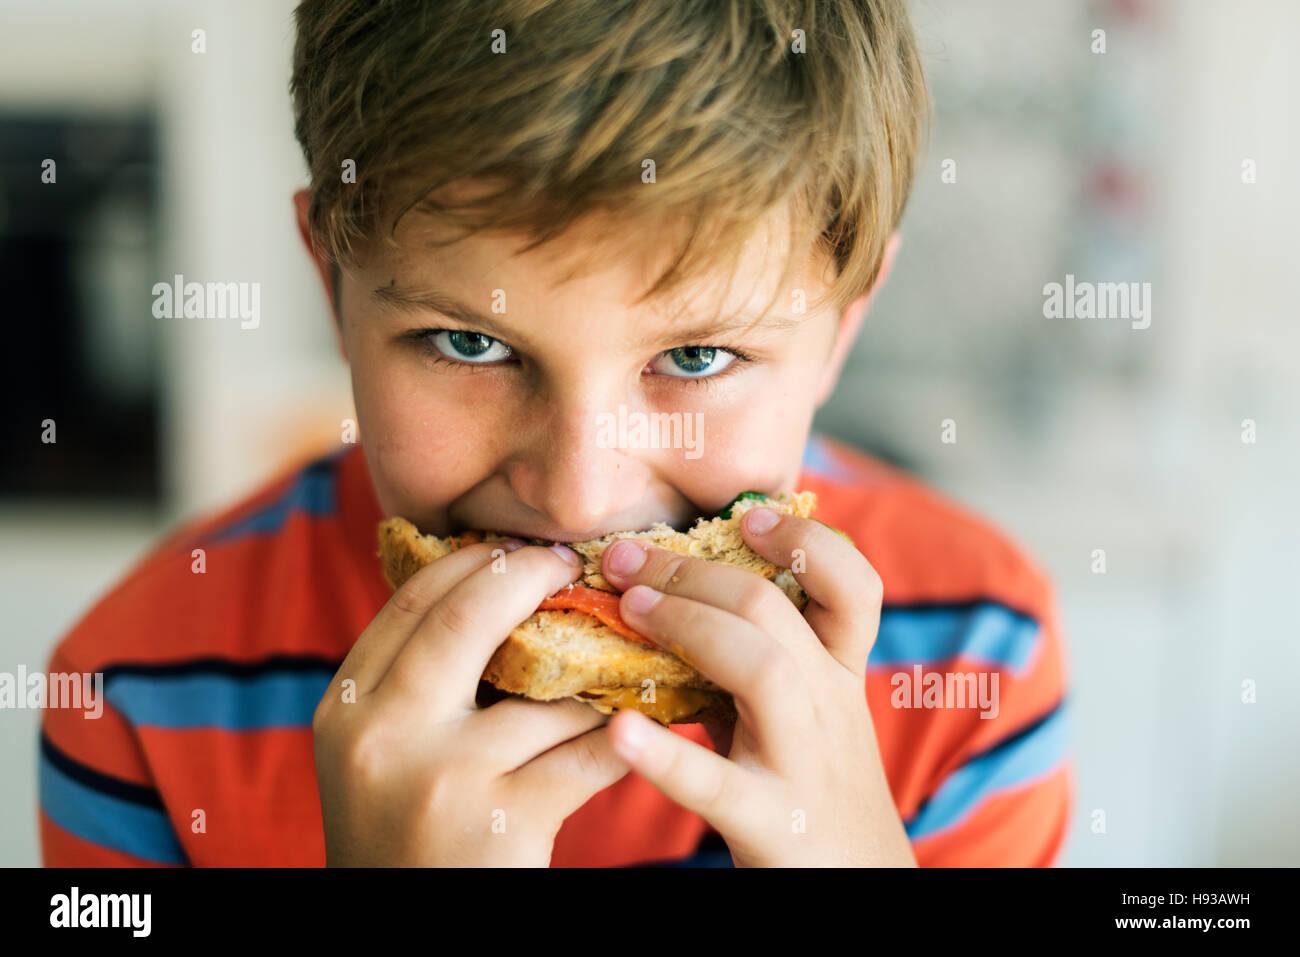 Kind Kinder Hunger Hunger Kid Sandwich-Konzept Stockbild